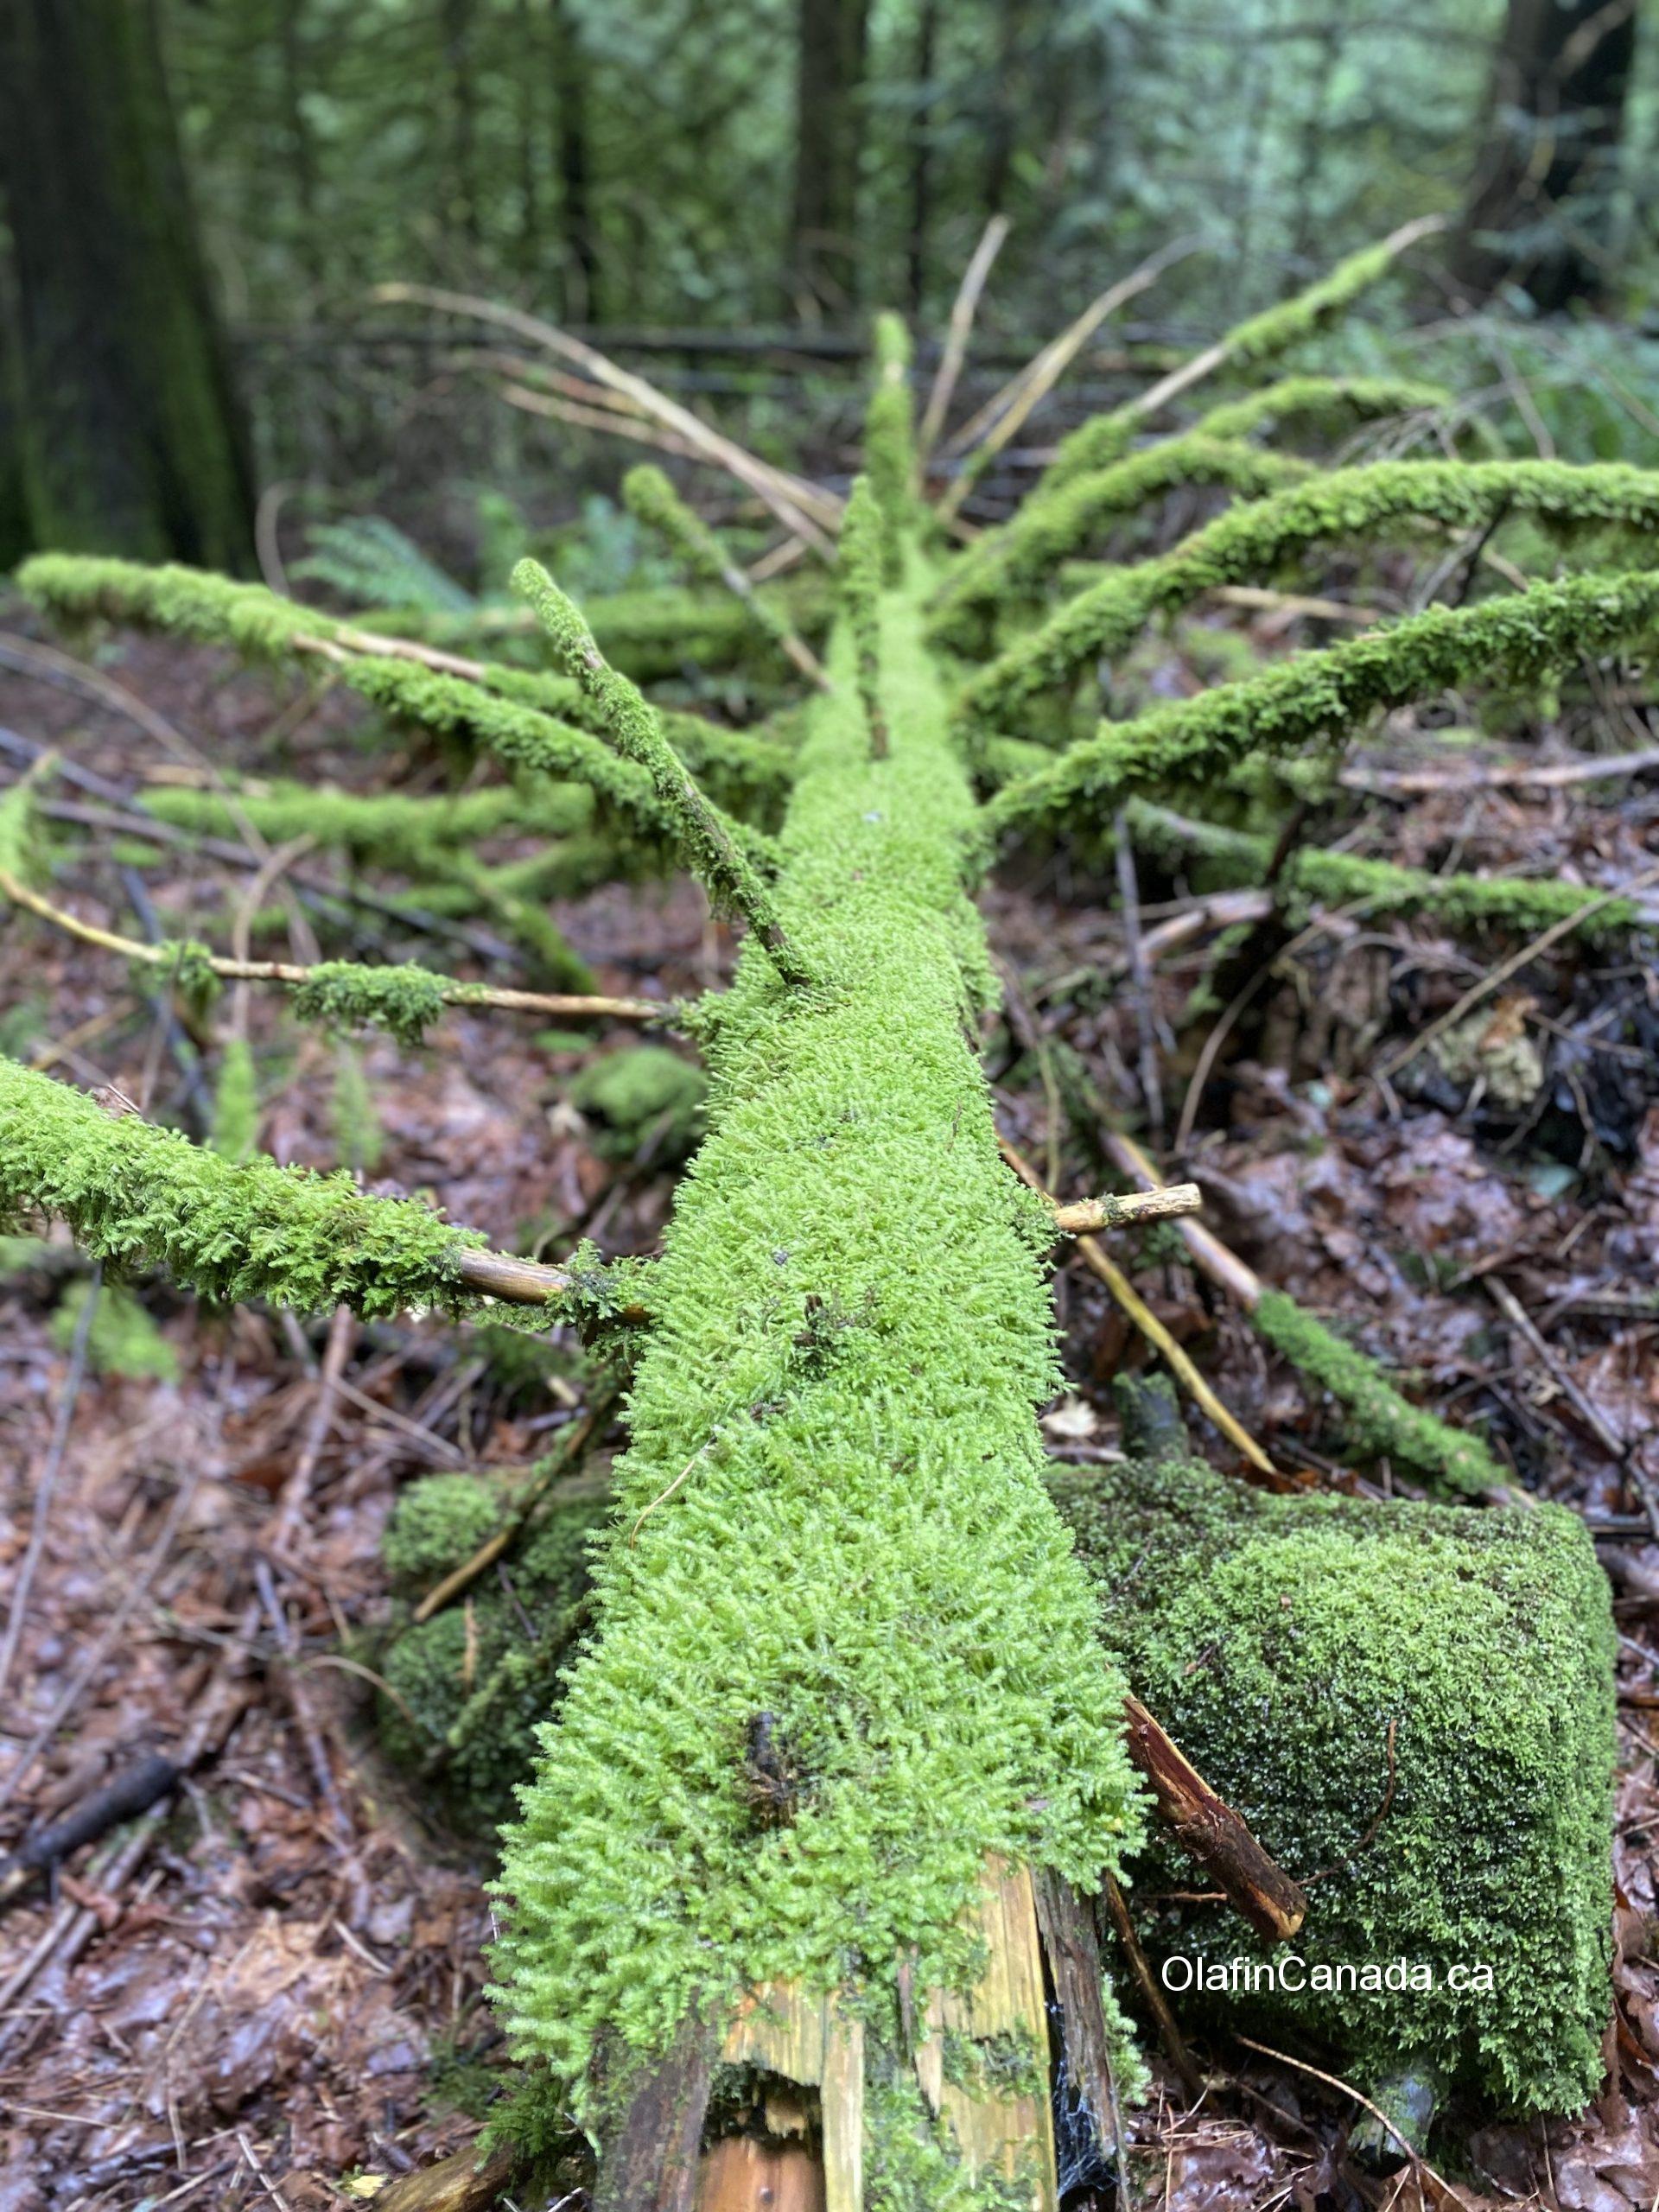 Mossy tree trunk #olafincanada #britishcolumbia #discoverbc #woods